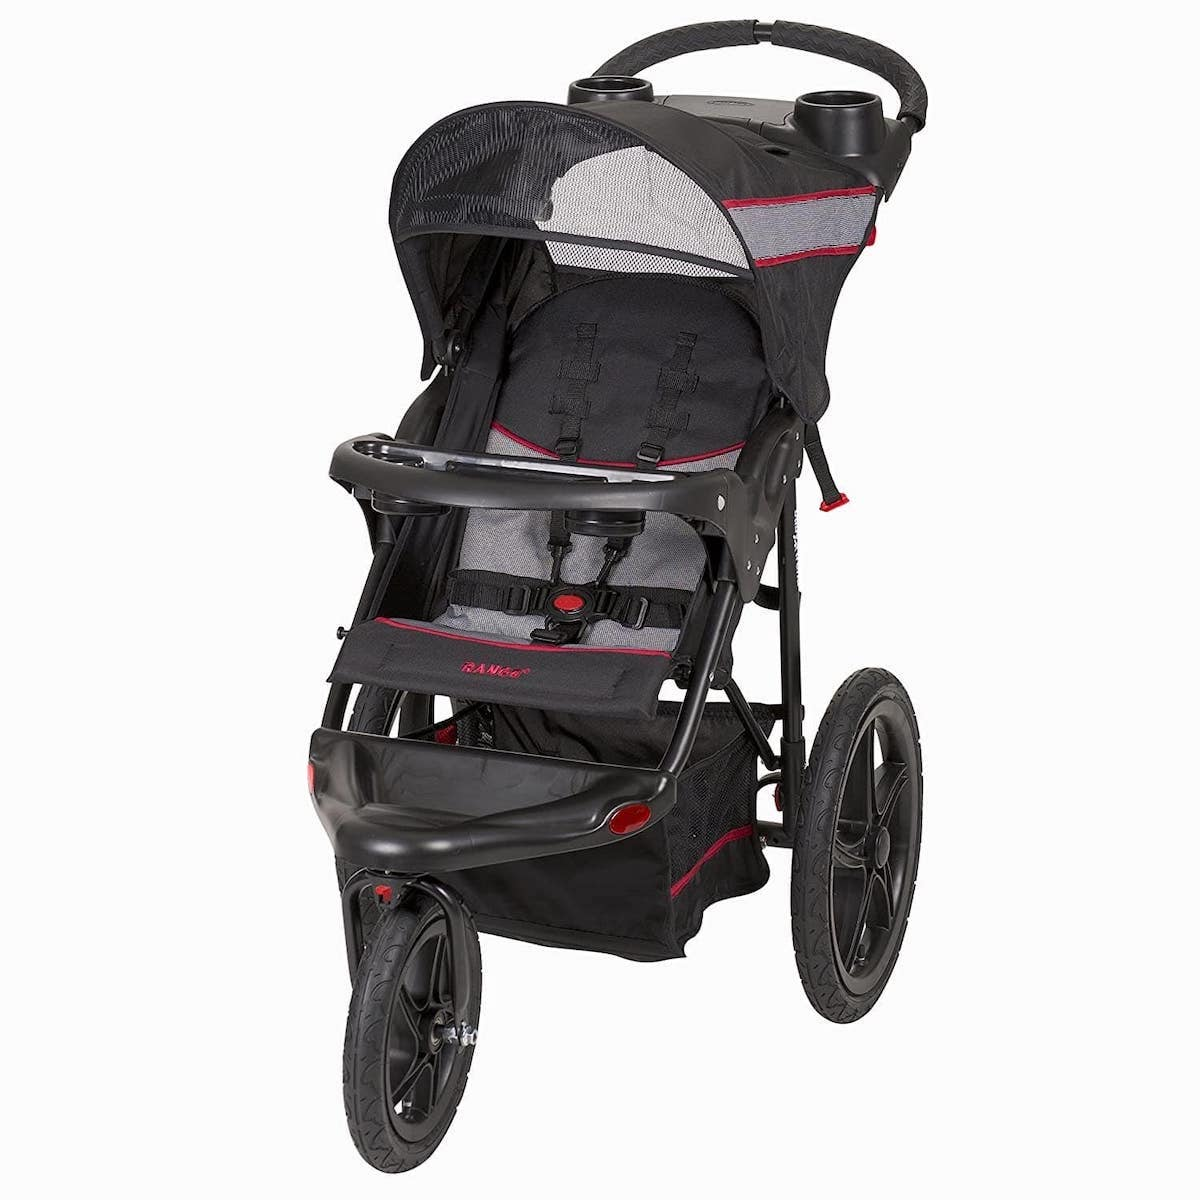 Baby Trend Range Jogger 3 wheel Stroller, Millennium